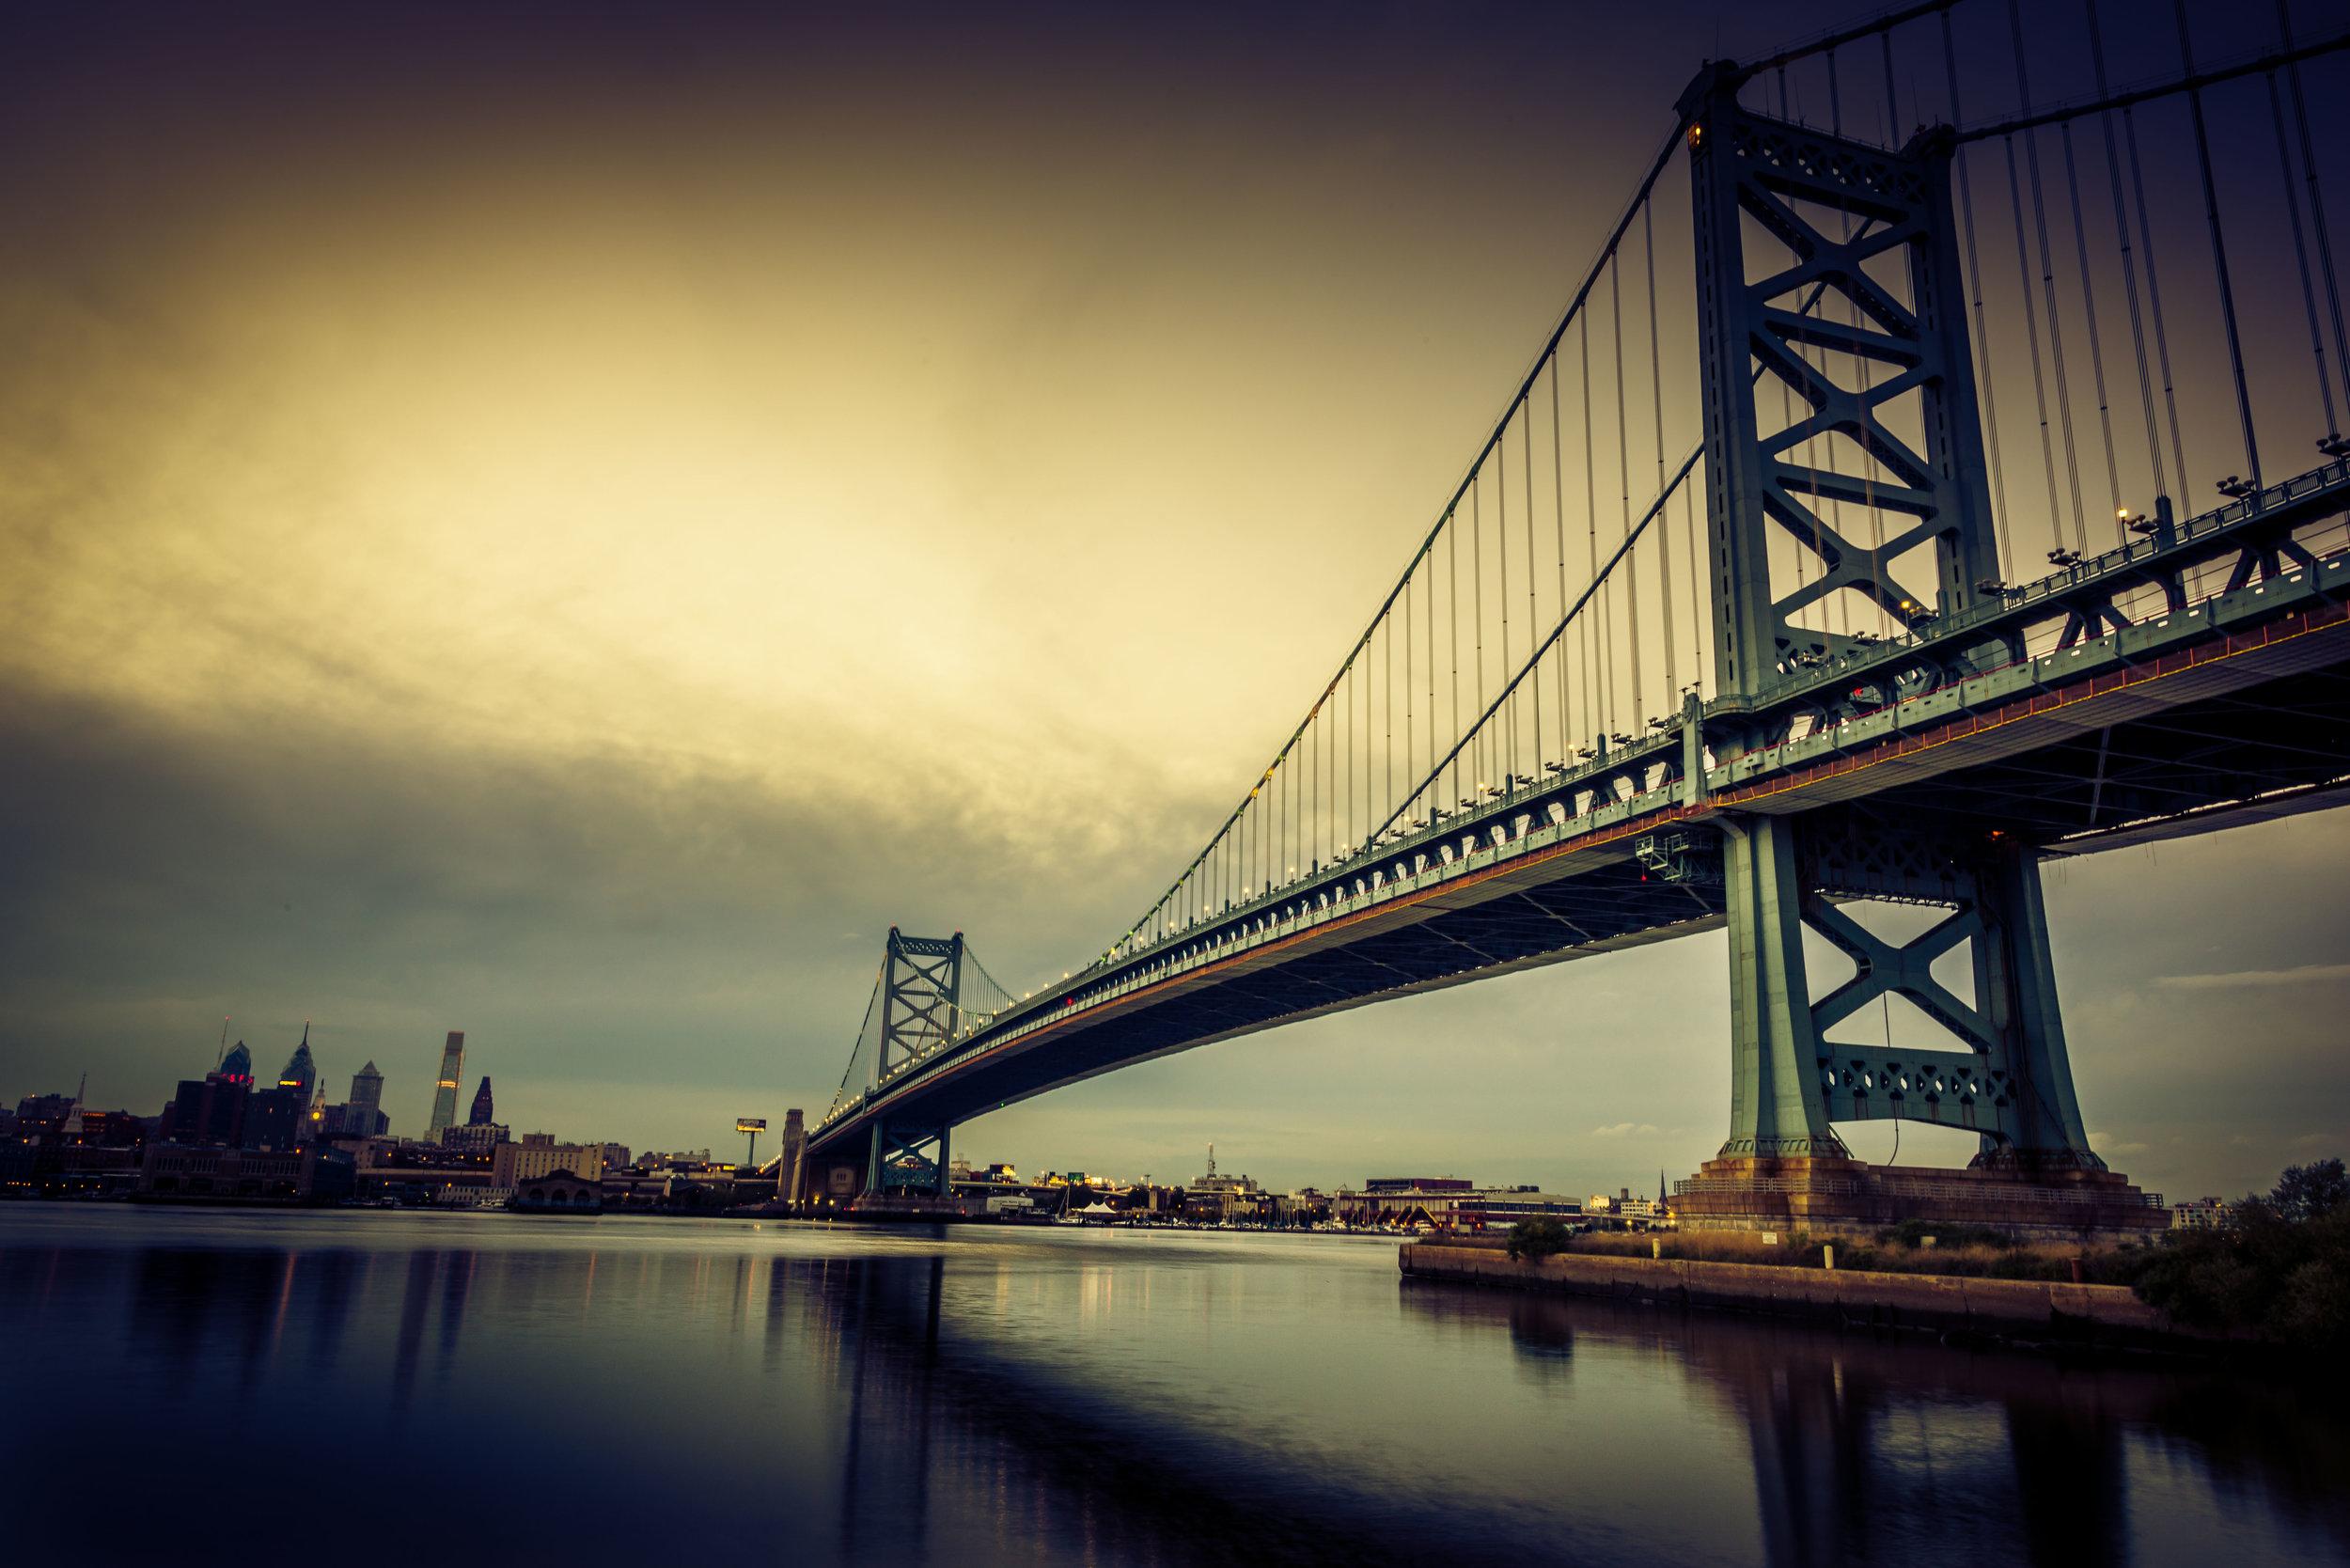 Philly-1169.jpg